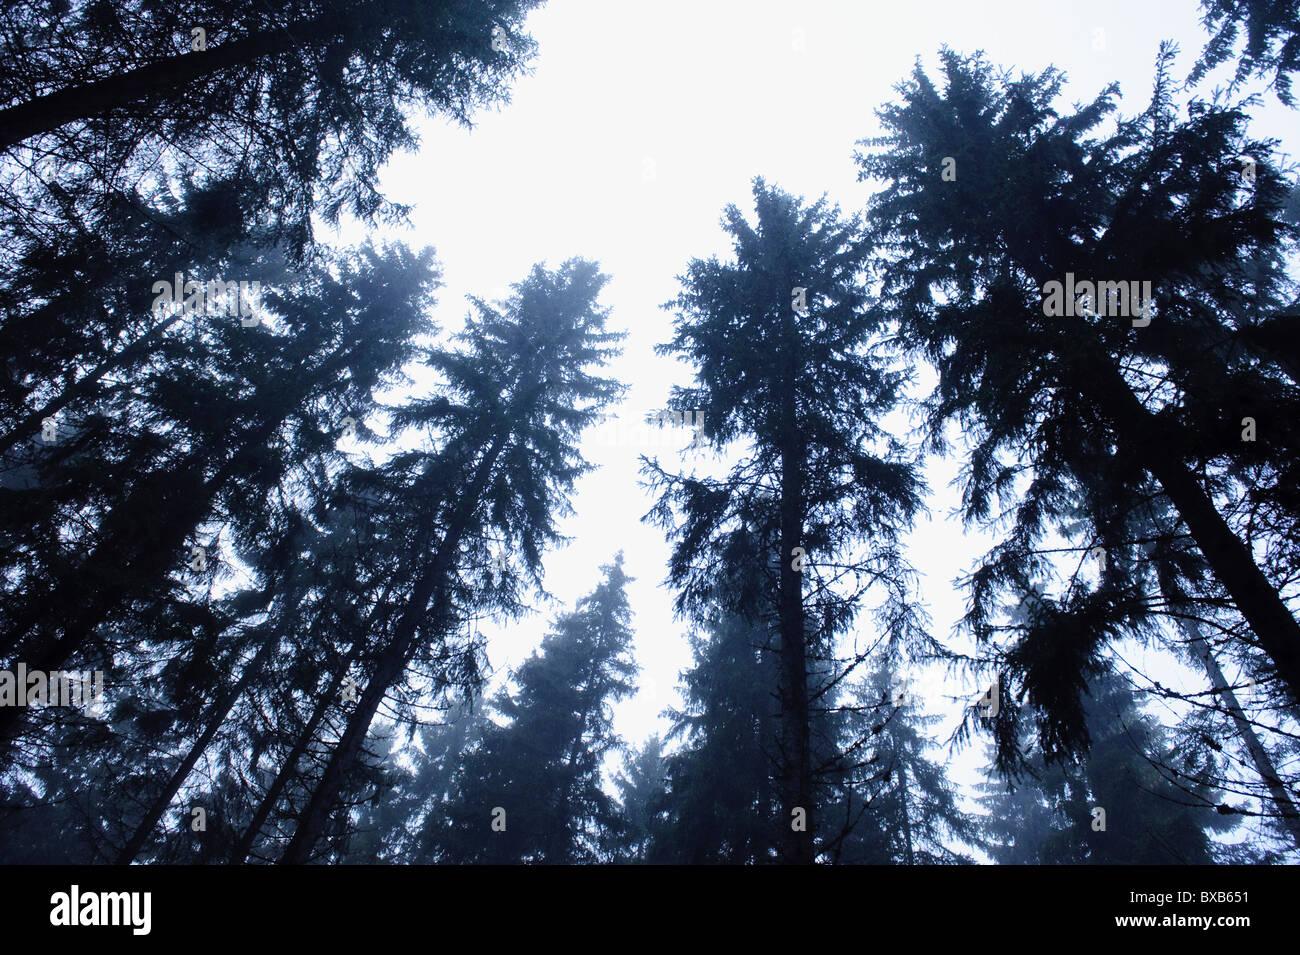 Evergreen trees against sky - Stock Image